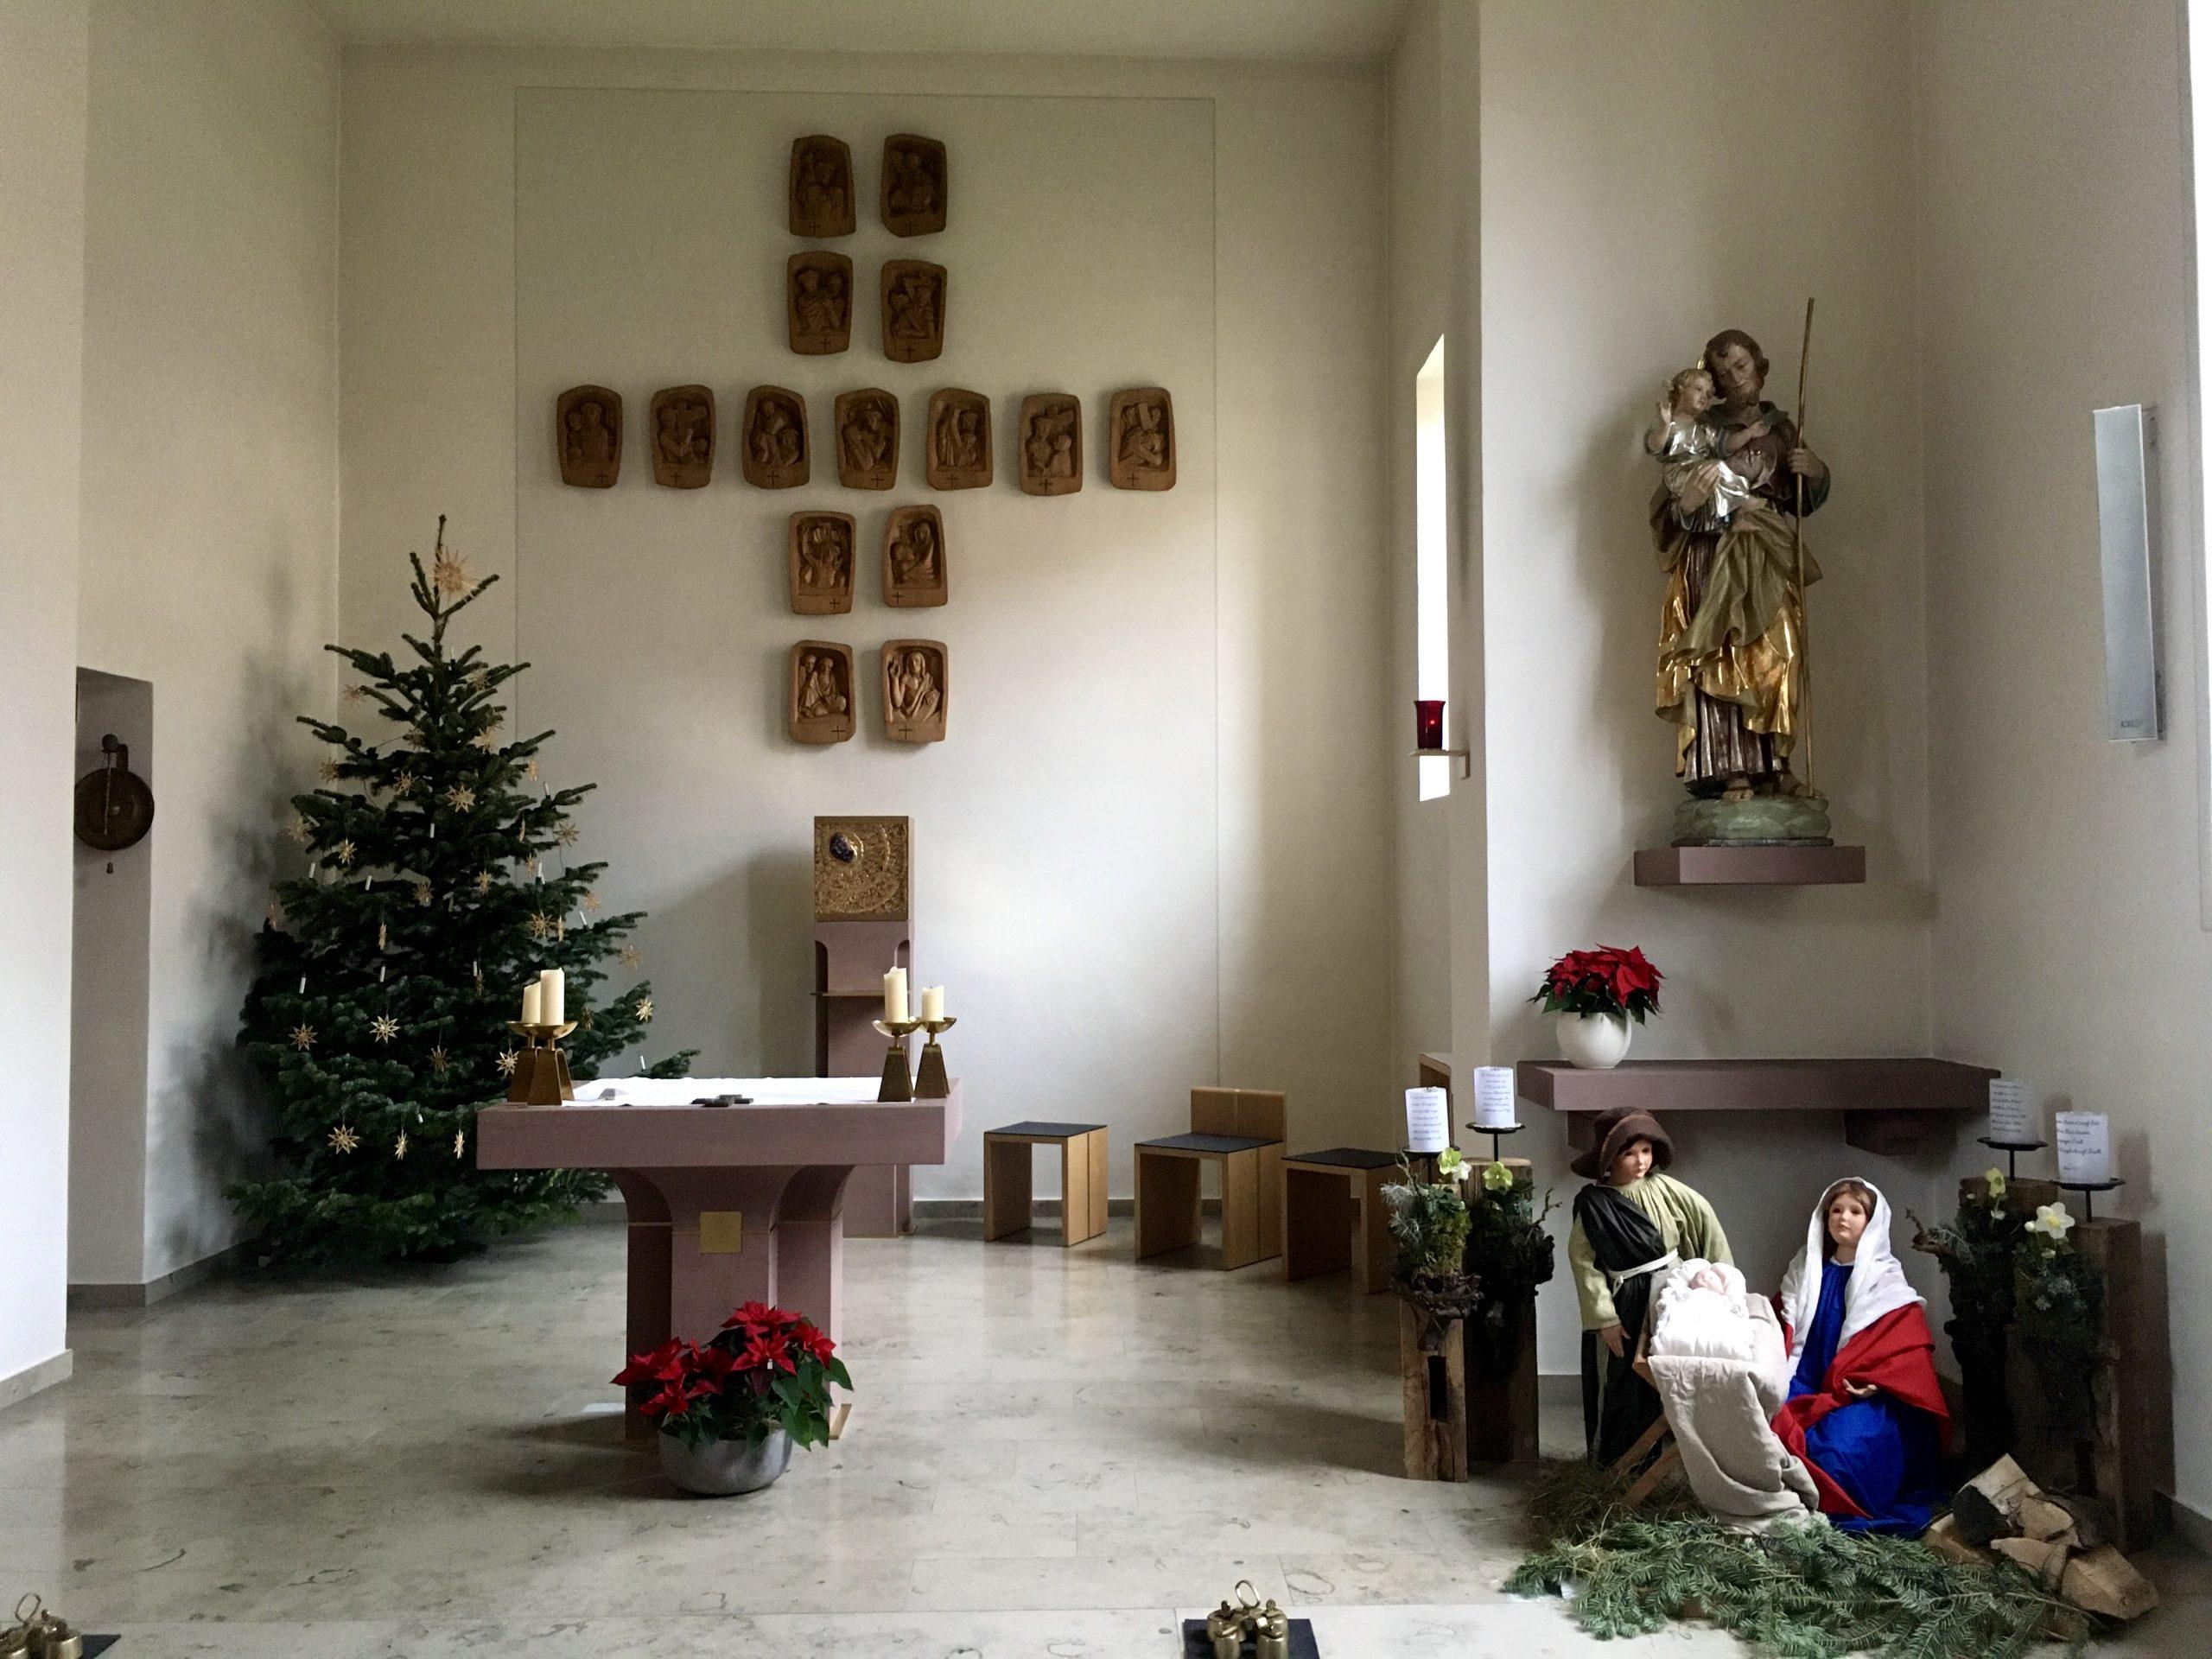 St. Barbara - Marienbrunn